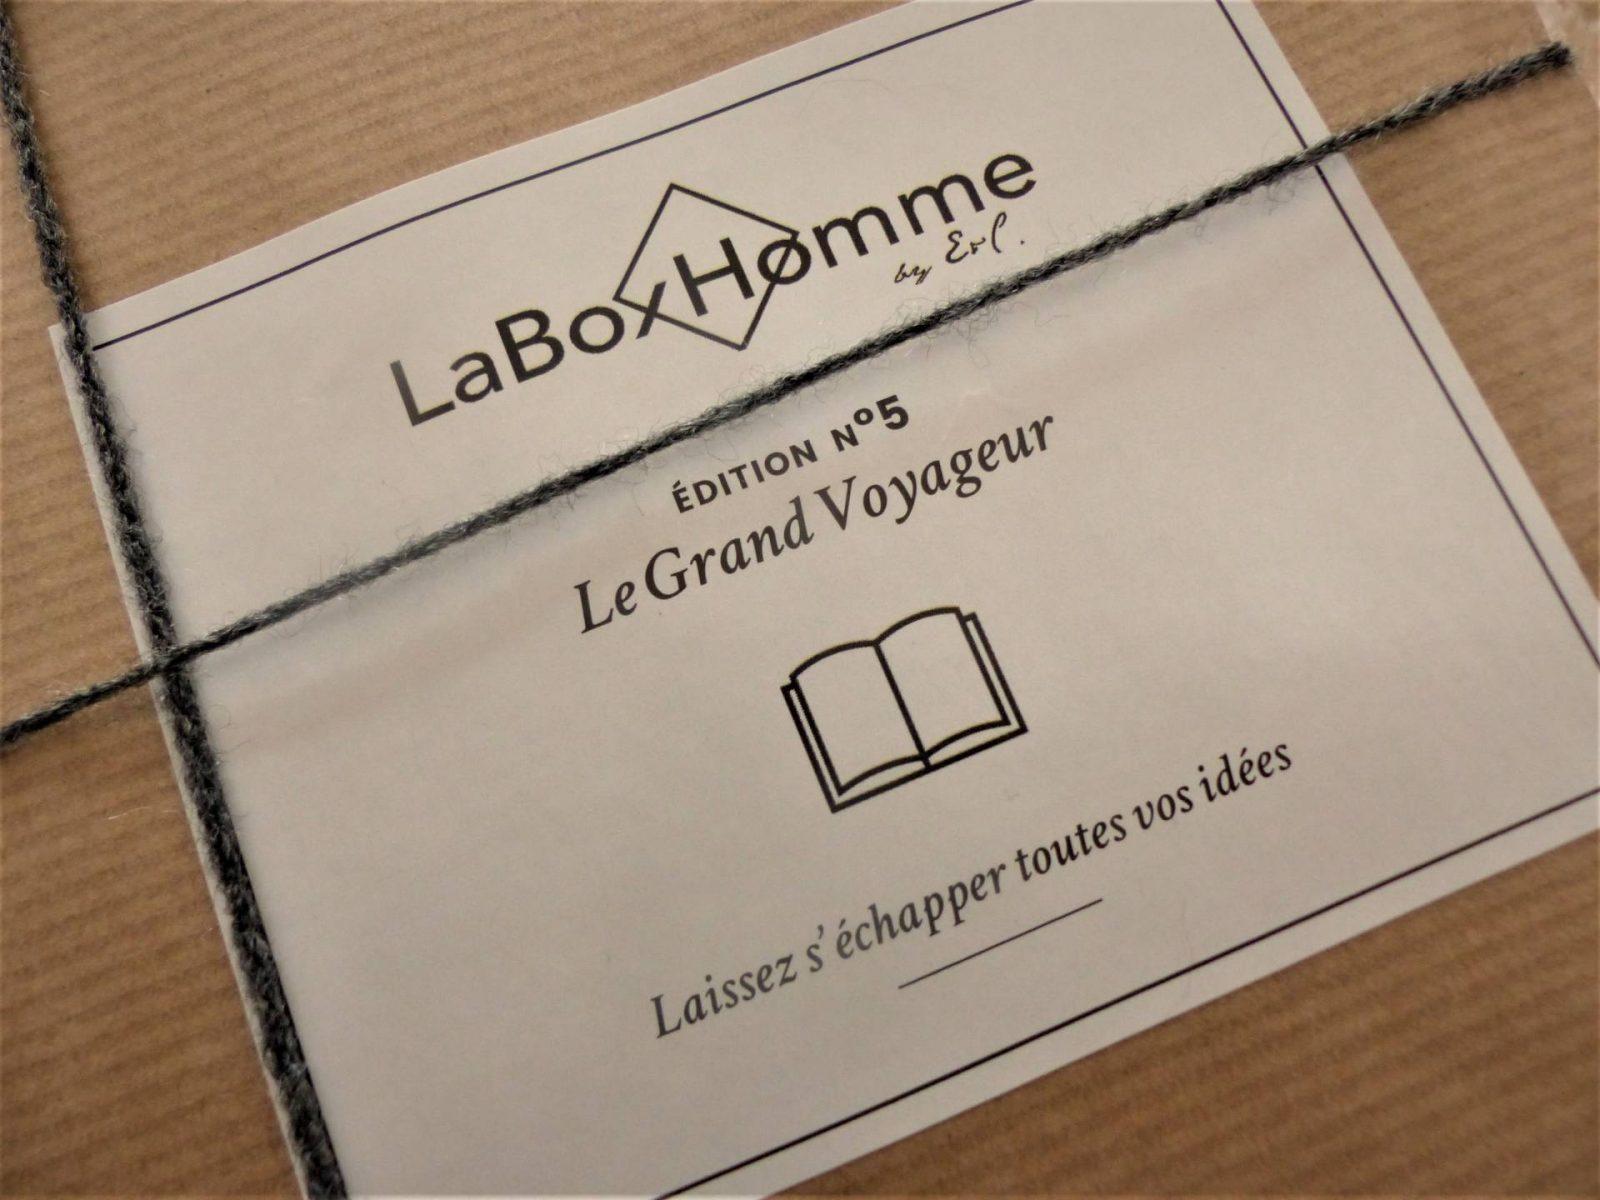 La-Box-Homme-Mars-2017-3-1600x1200